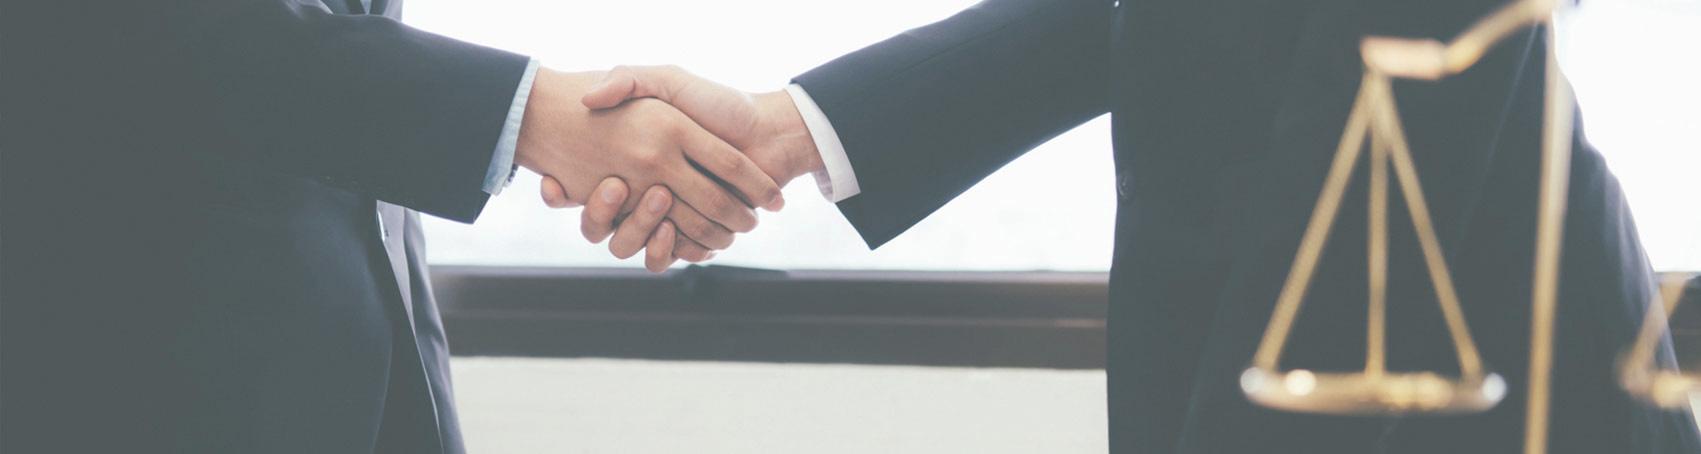 Besoins juridiques - Fidaquitaine